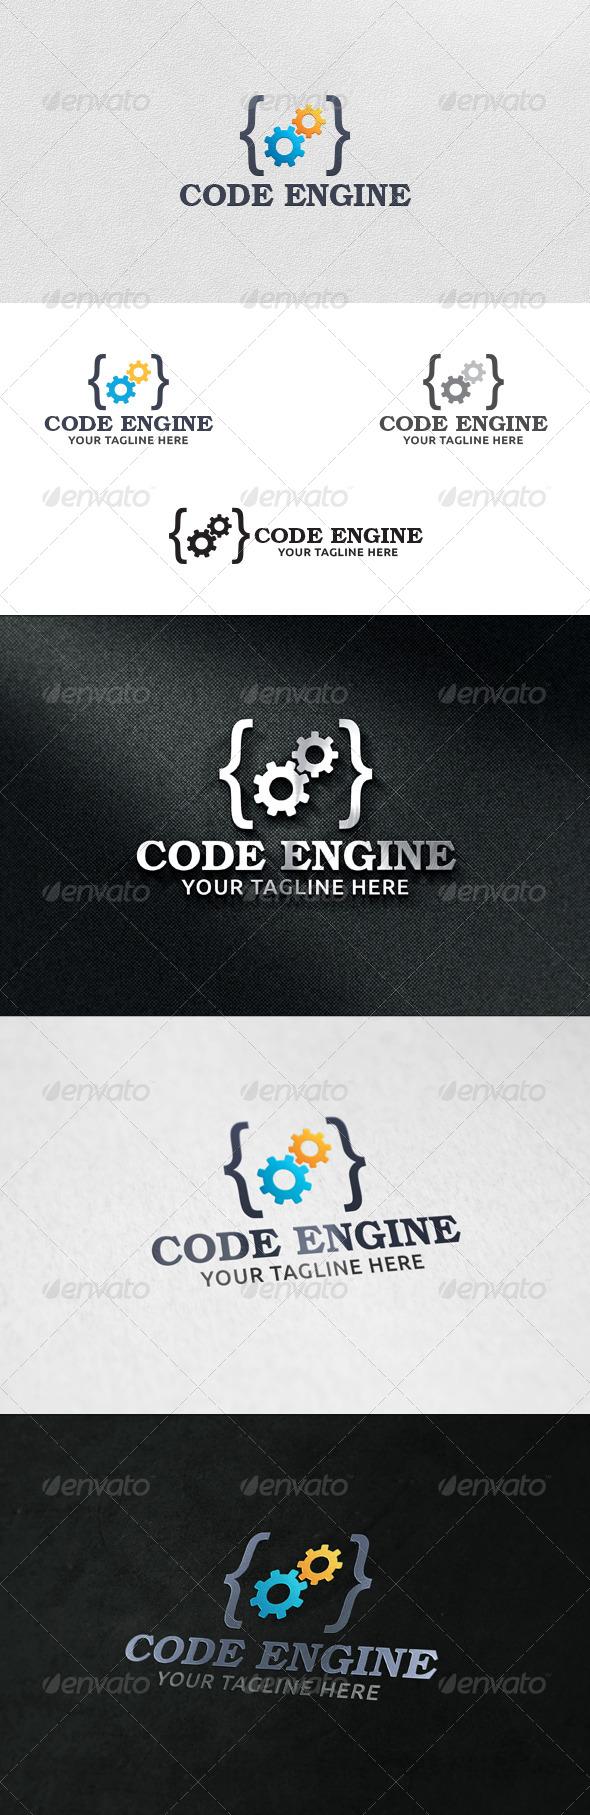 Code Engine - Logo Template - Symbols Logo Templates